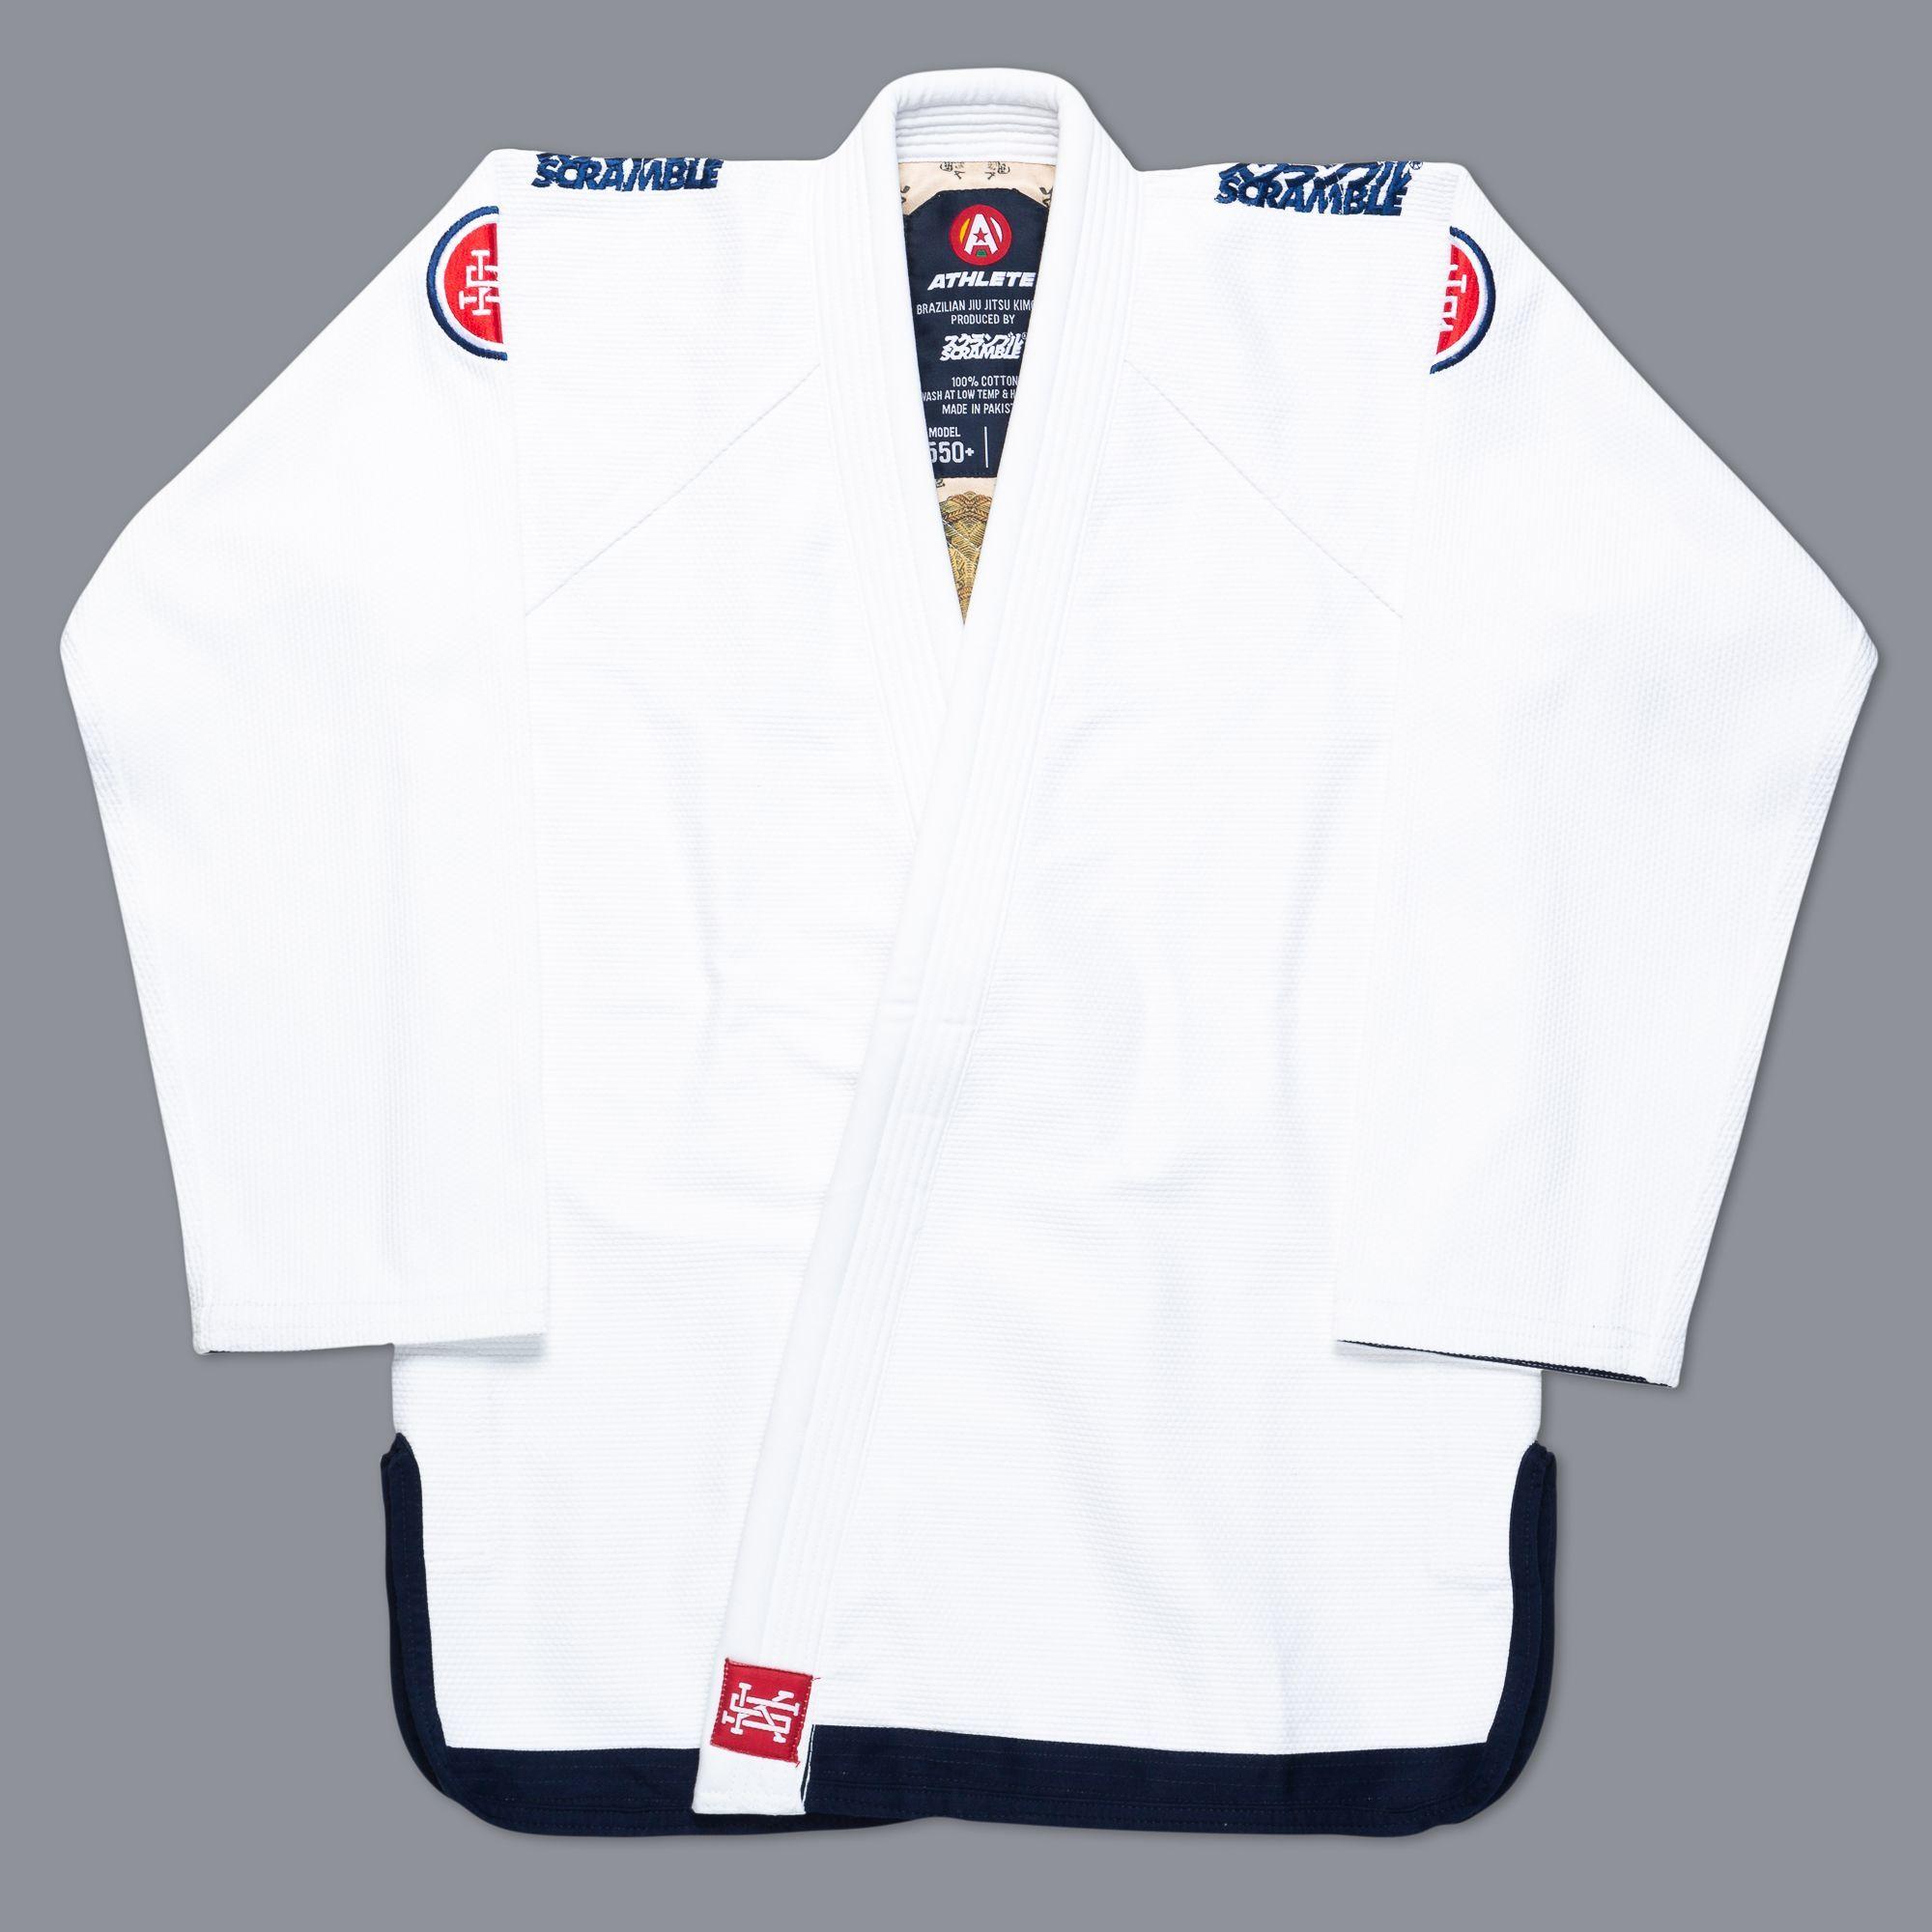 SCRAMBLE ATHLETE 4: 550+ ( ホワイト、白)|ブラジリアン柔術衣